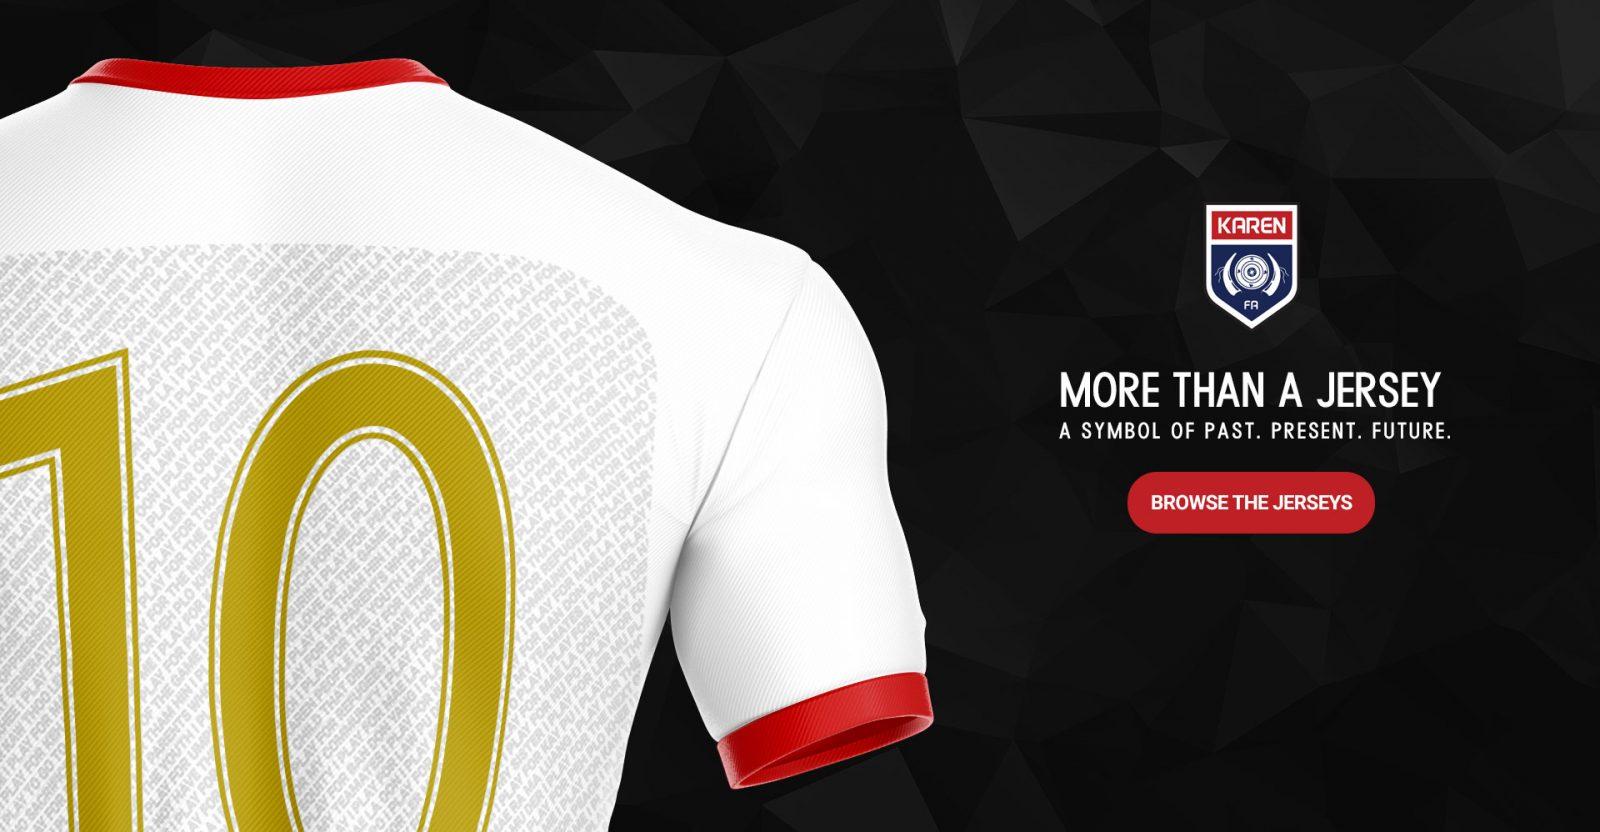 karen-national-team-full-image-header-desktop-home-national-team-jerseys2